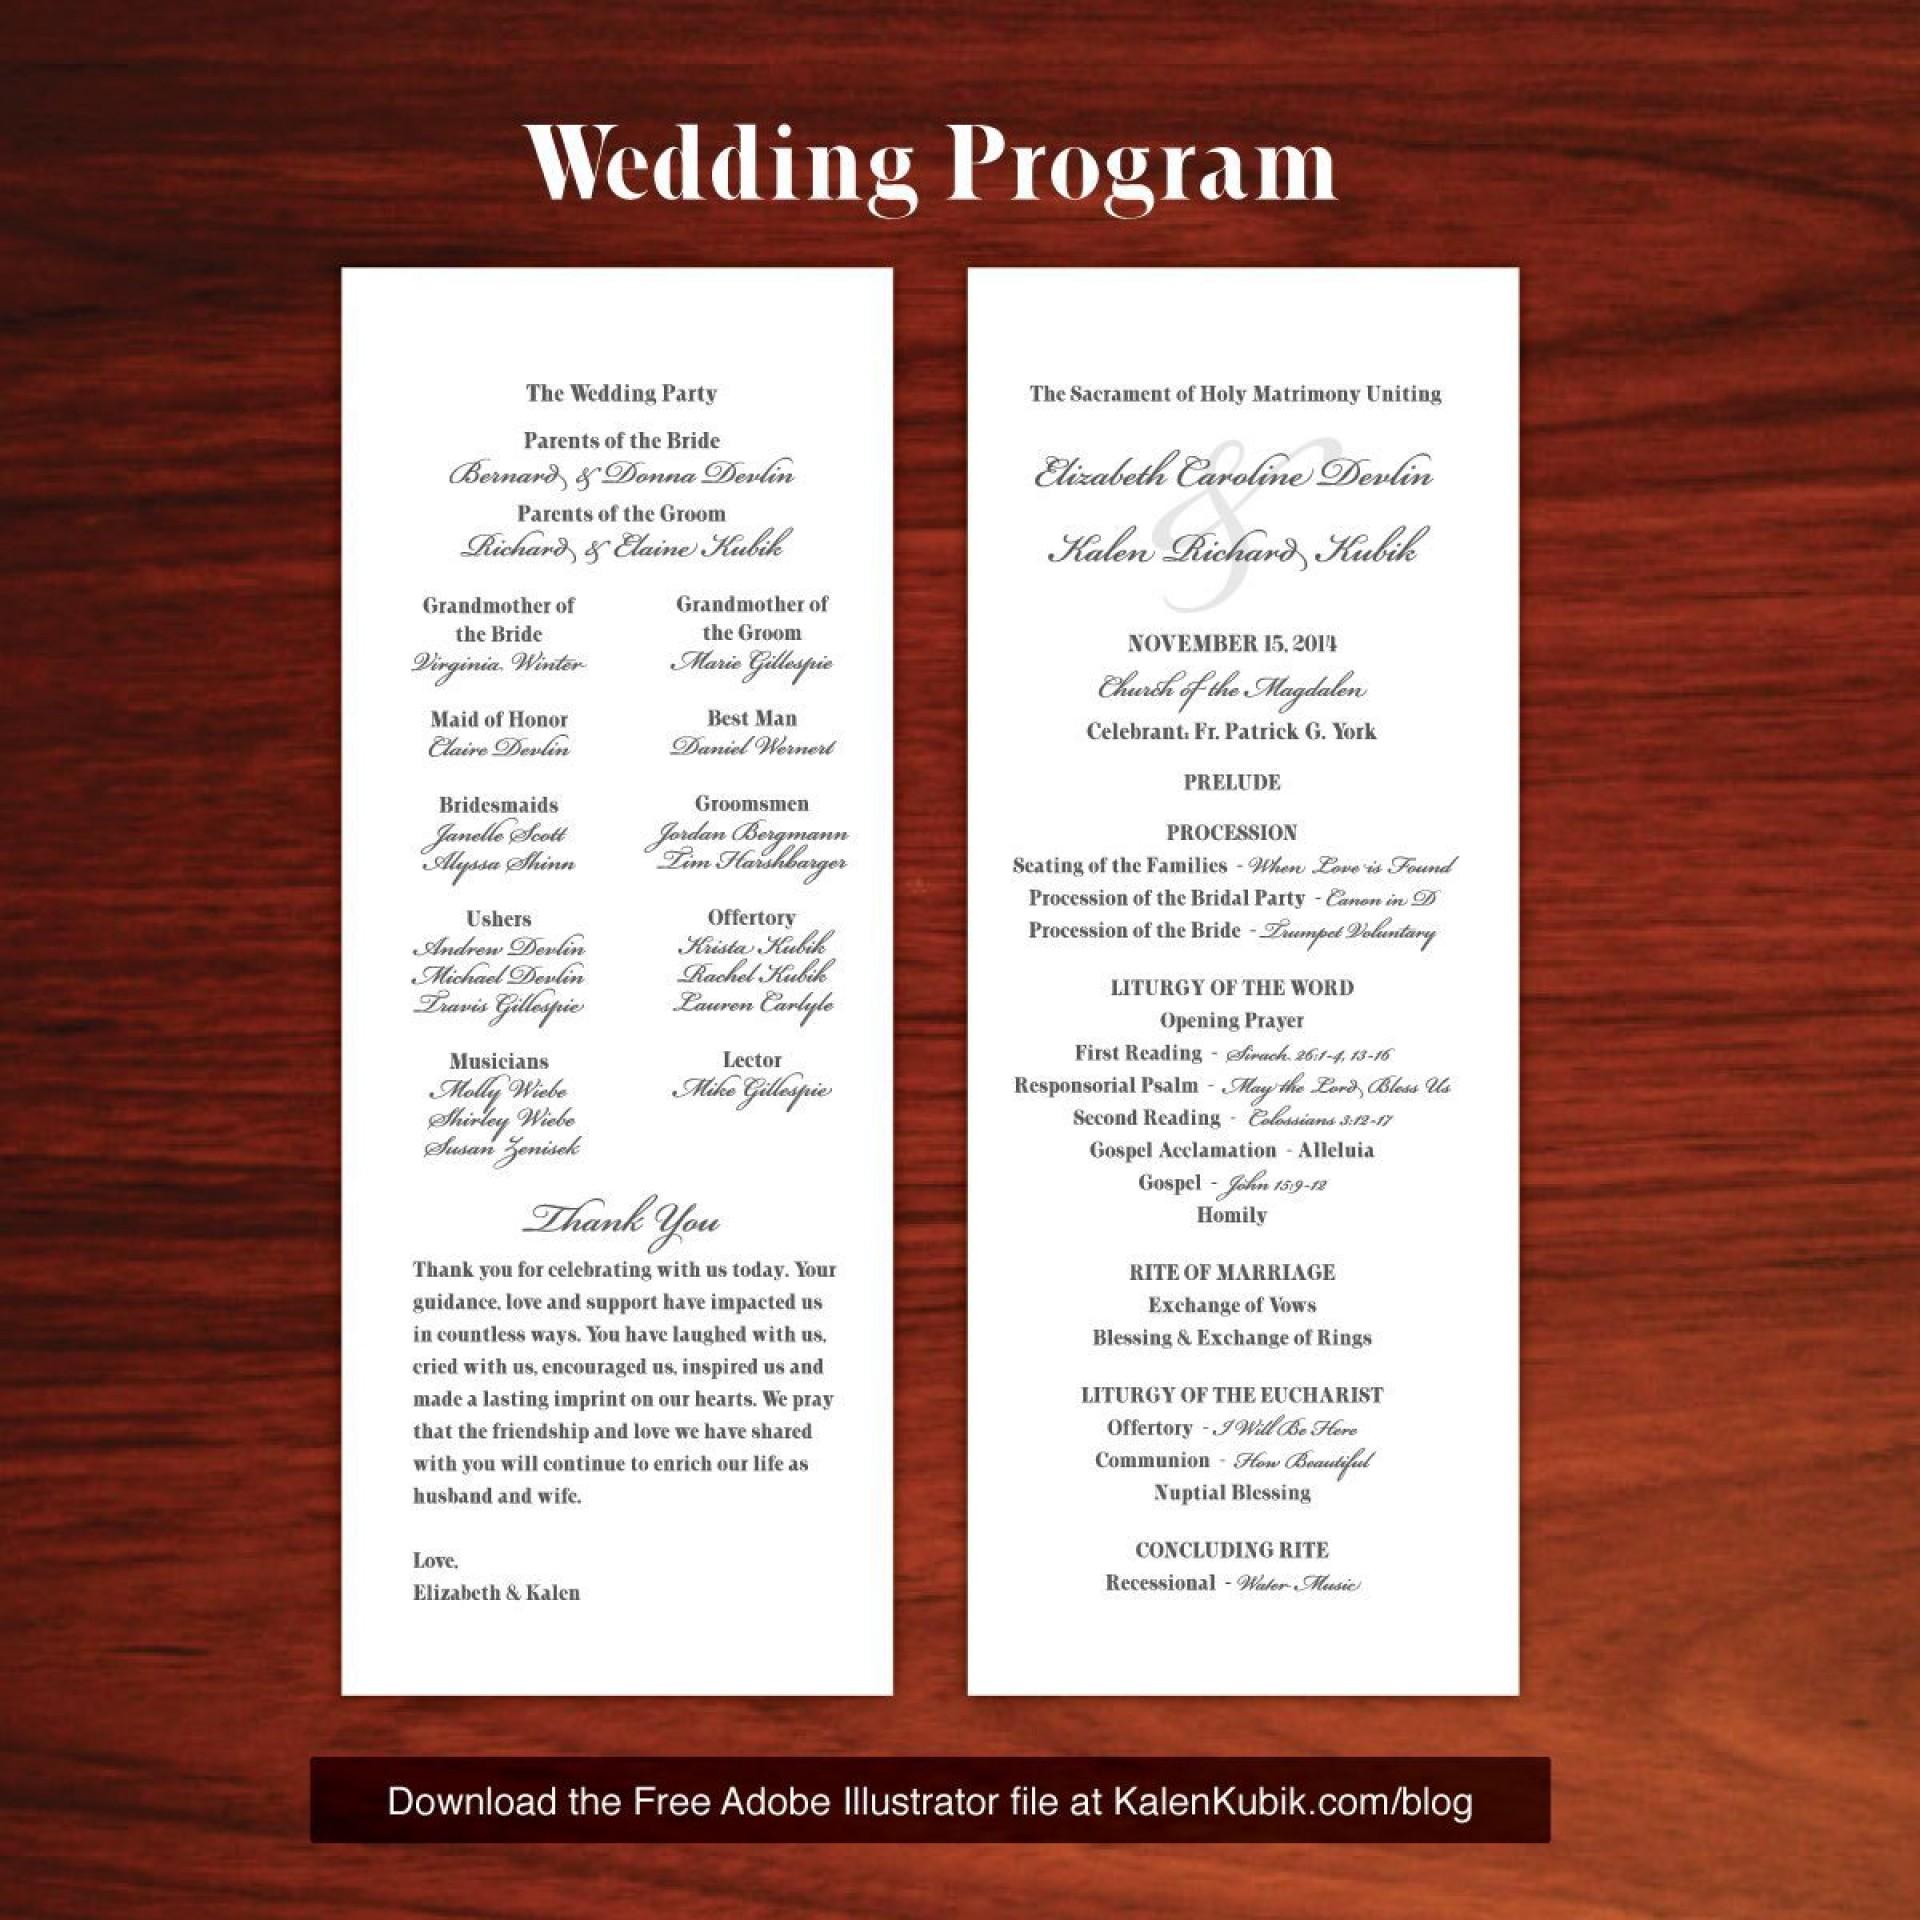 004 Stupendou Wedding Program Template Free Download Sample  Downloadable Pdf Reception Microsoft Word Fan1920